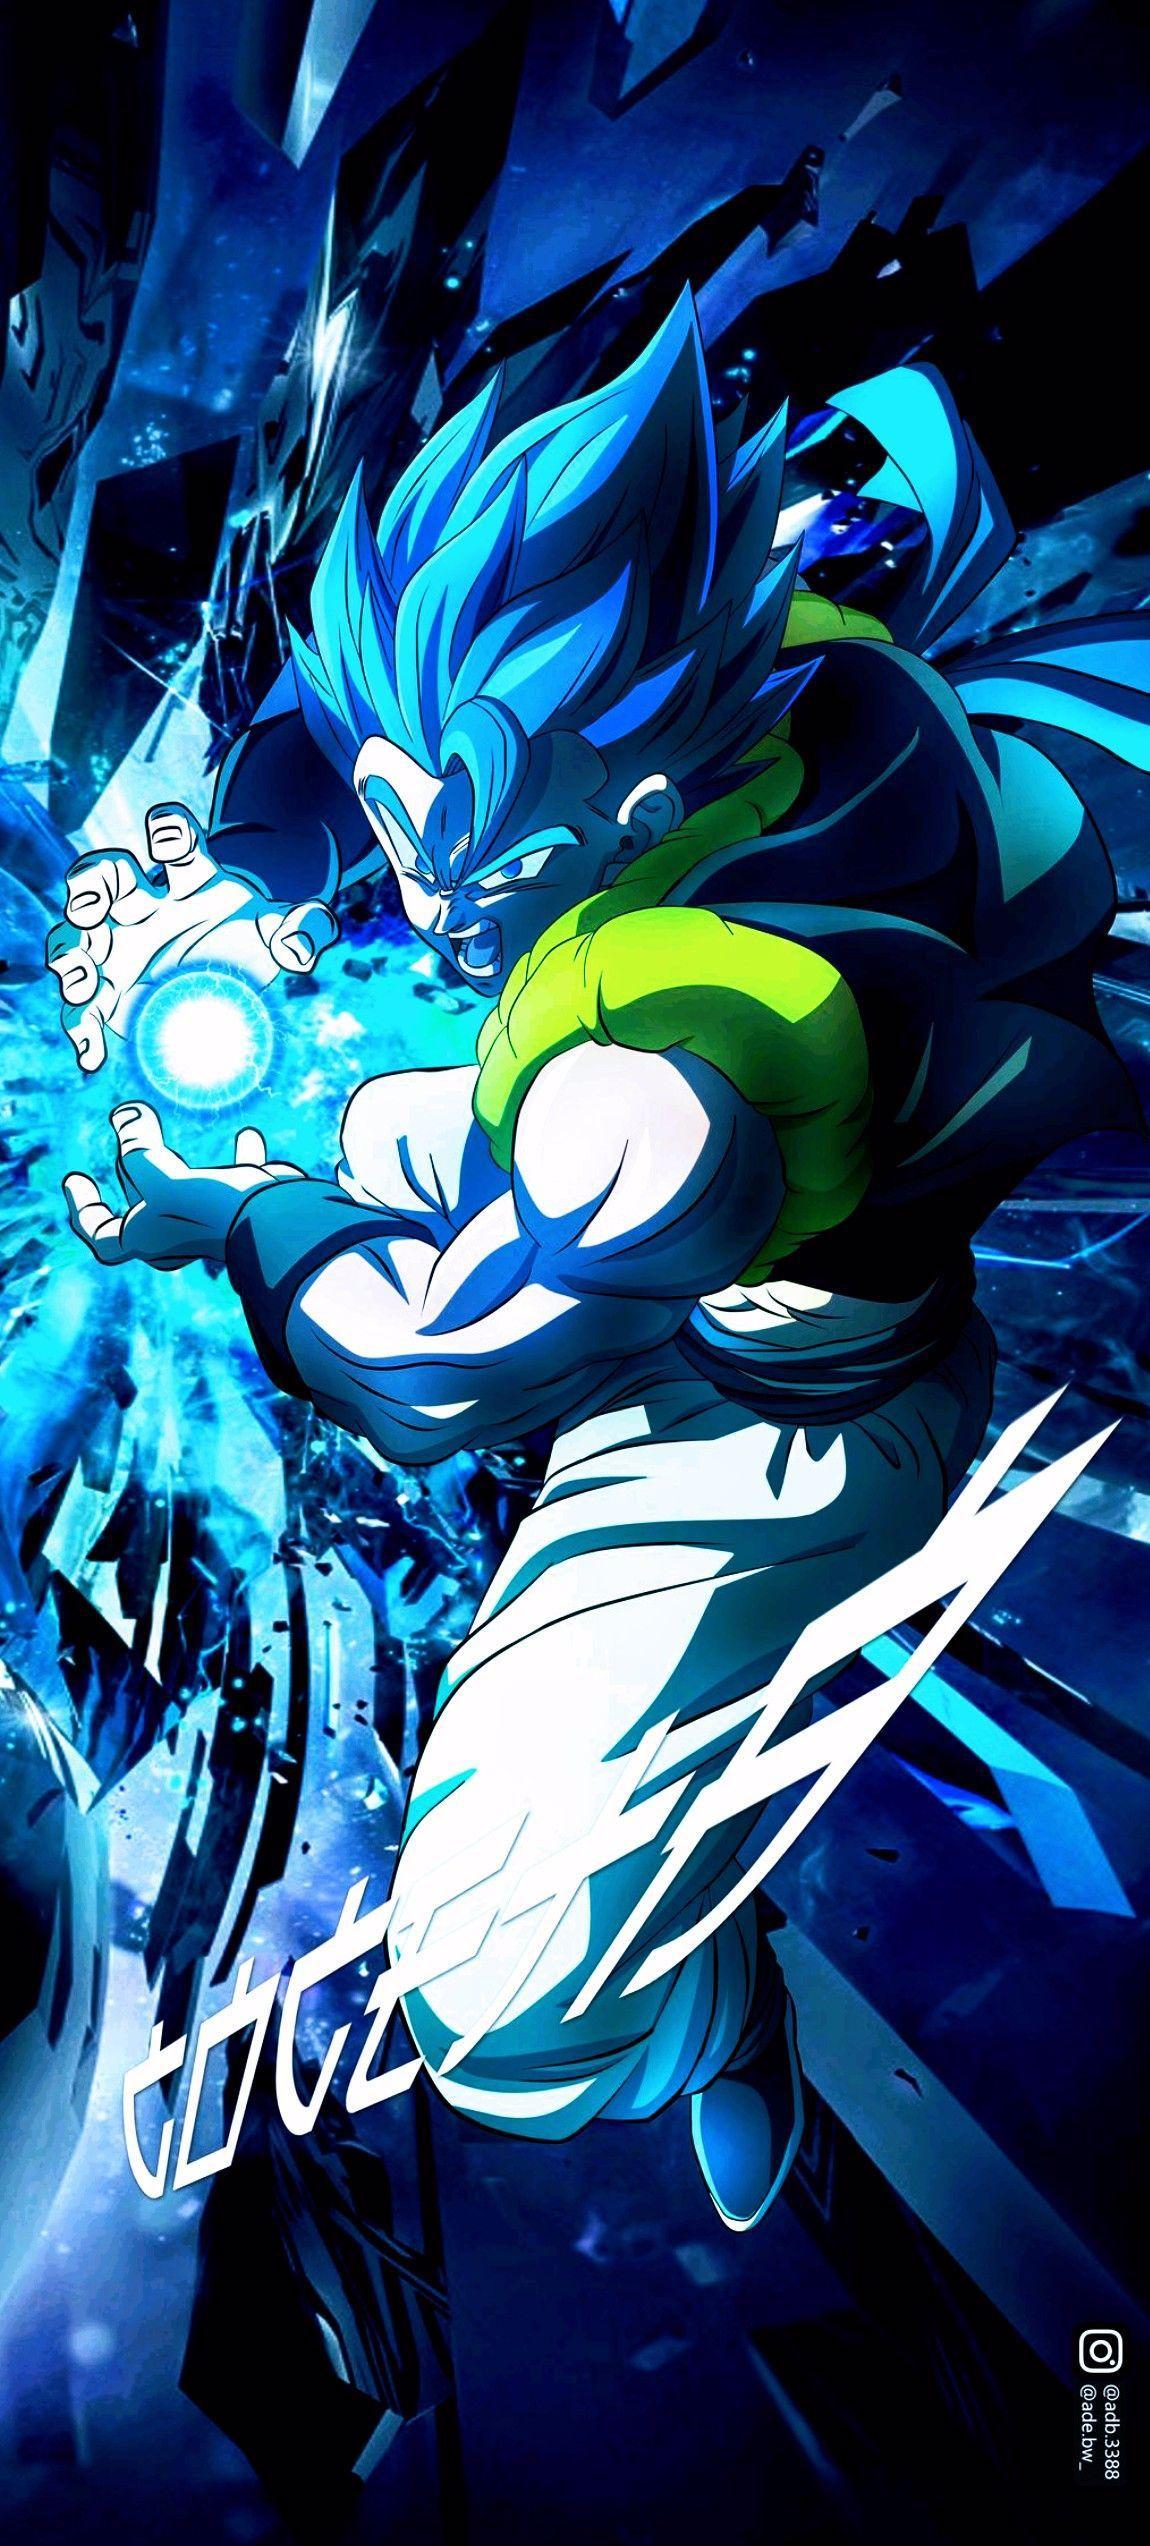 Gogeta Super Saiyan Blue, Dragon Ball Super in 2020 ...